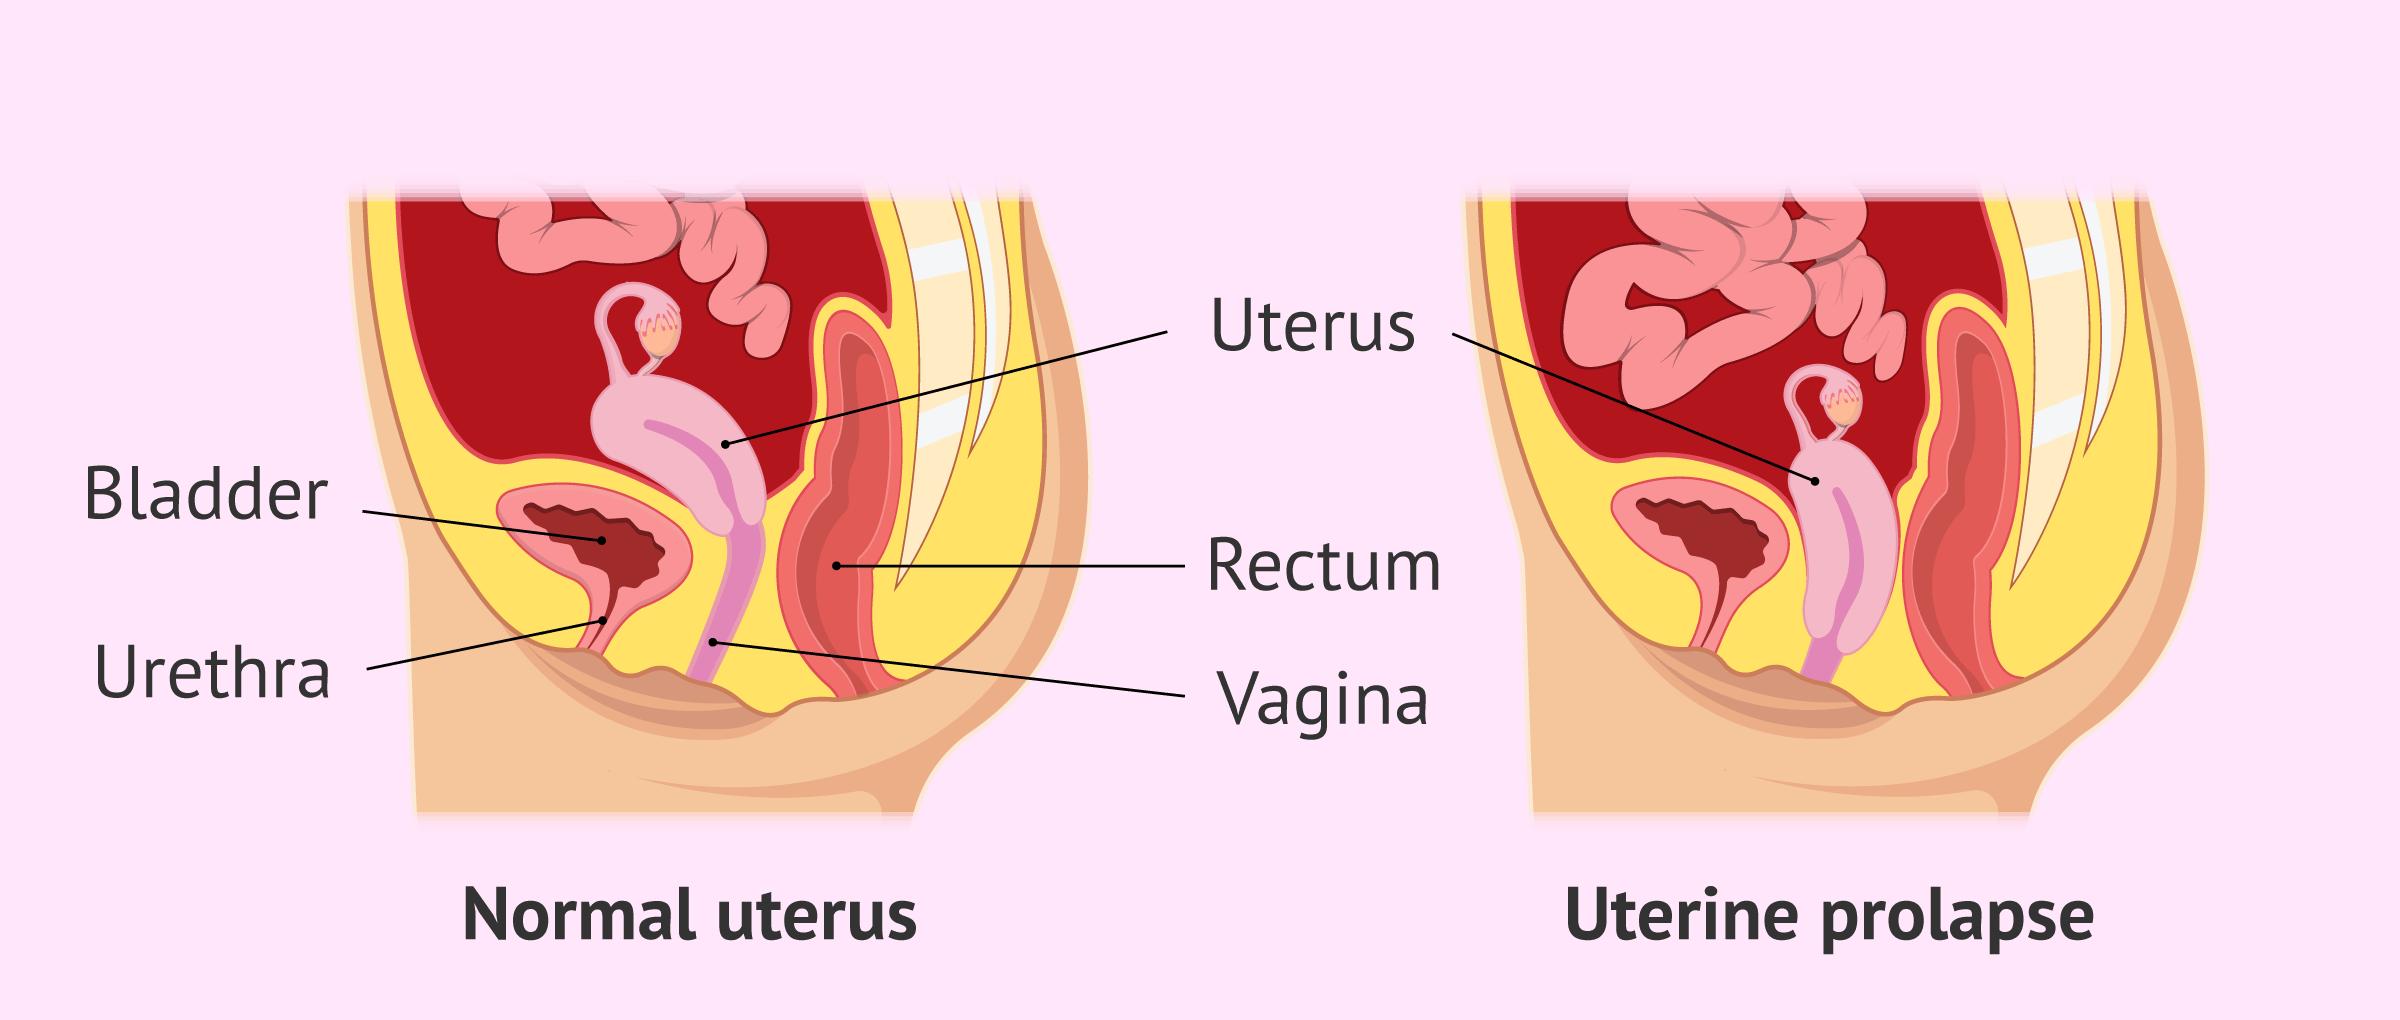 Uterine Prolapse - Symptoms, Stages & Treatment